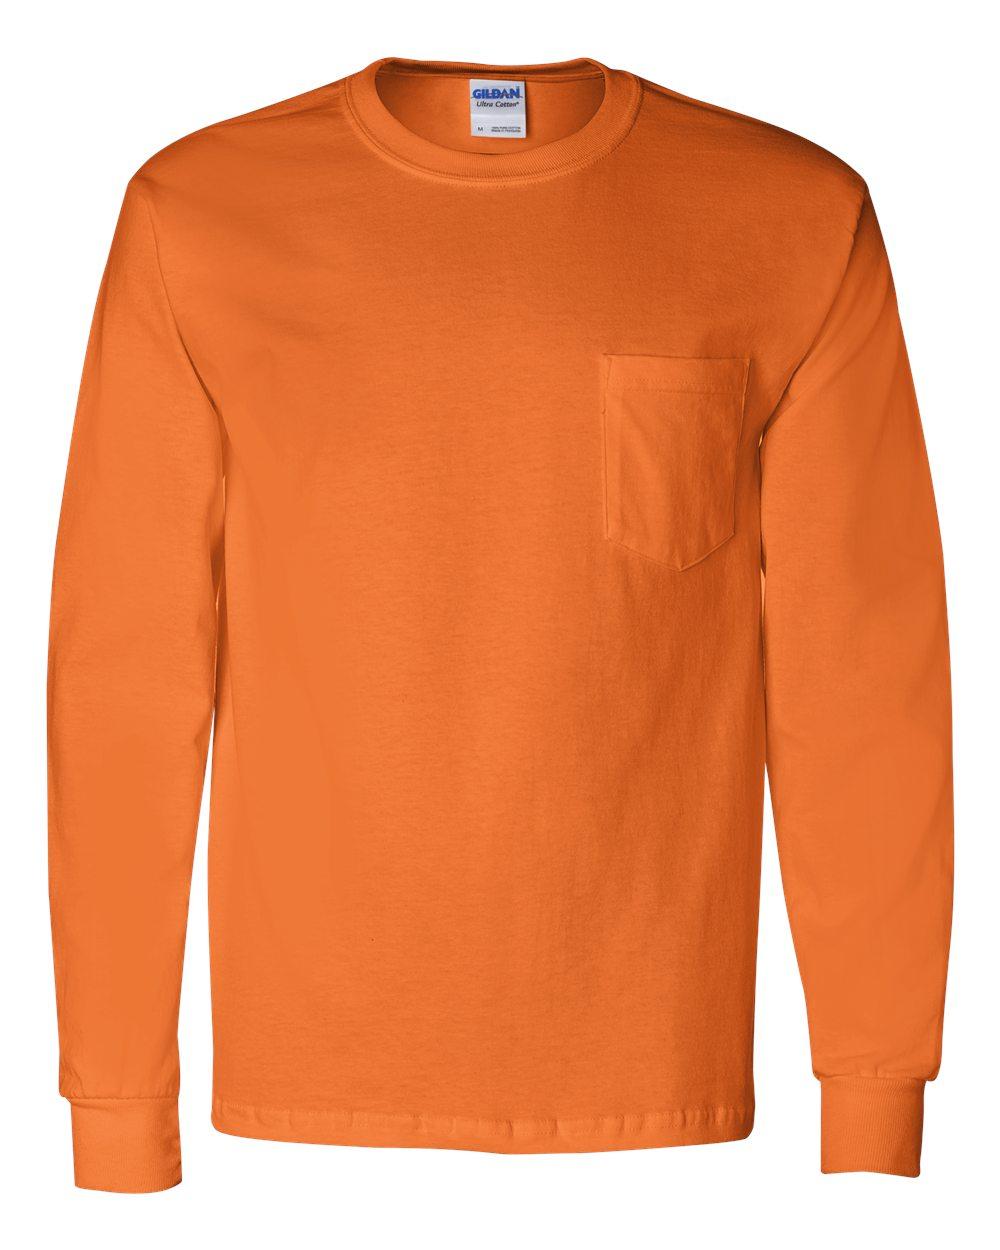 click to view orange.